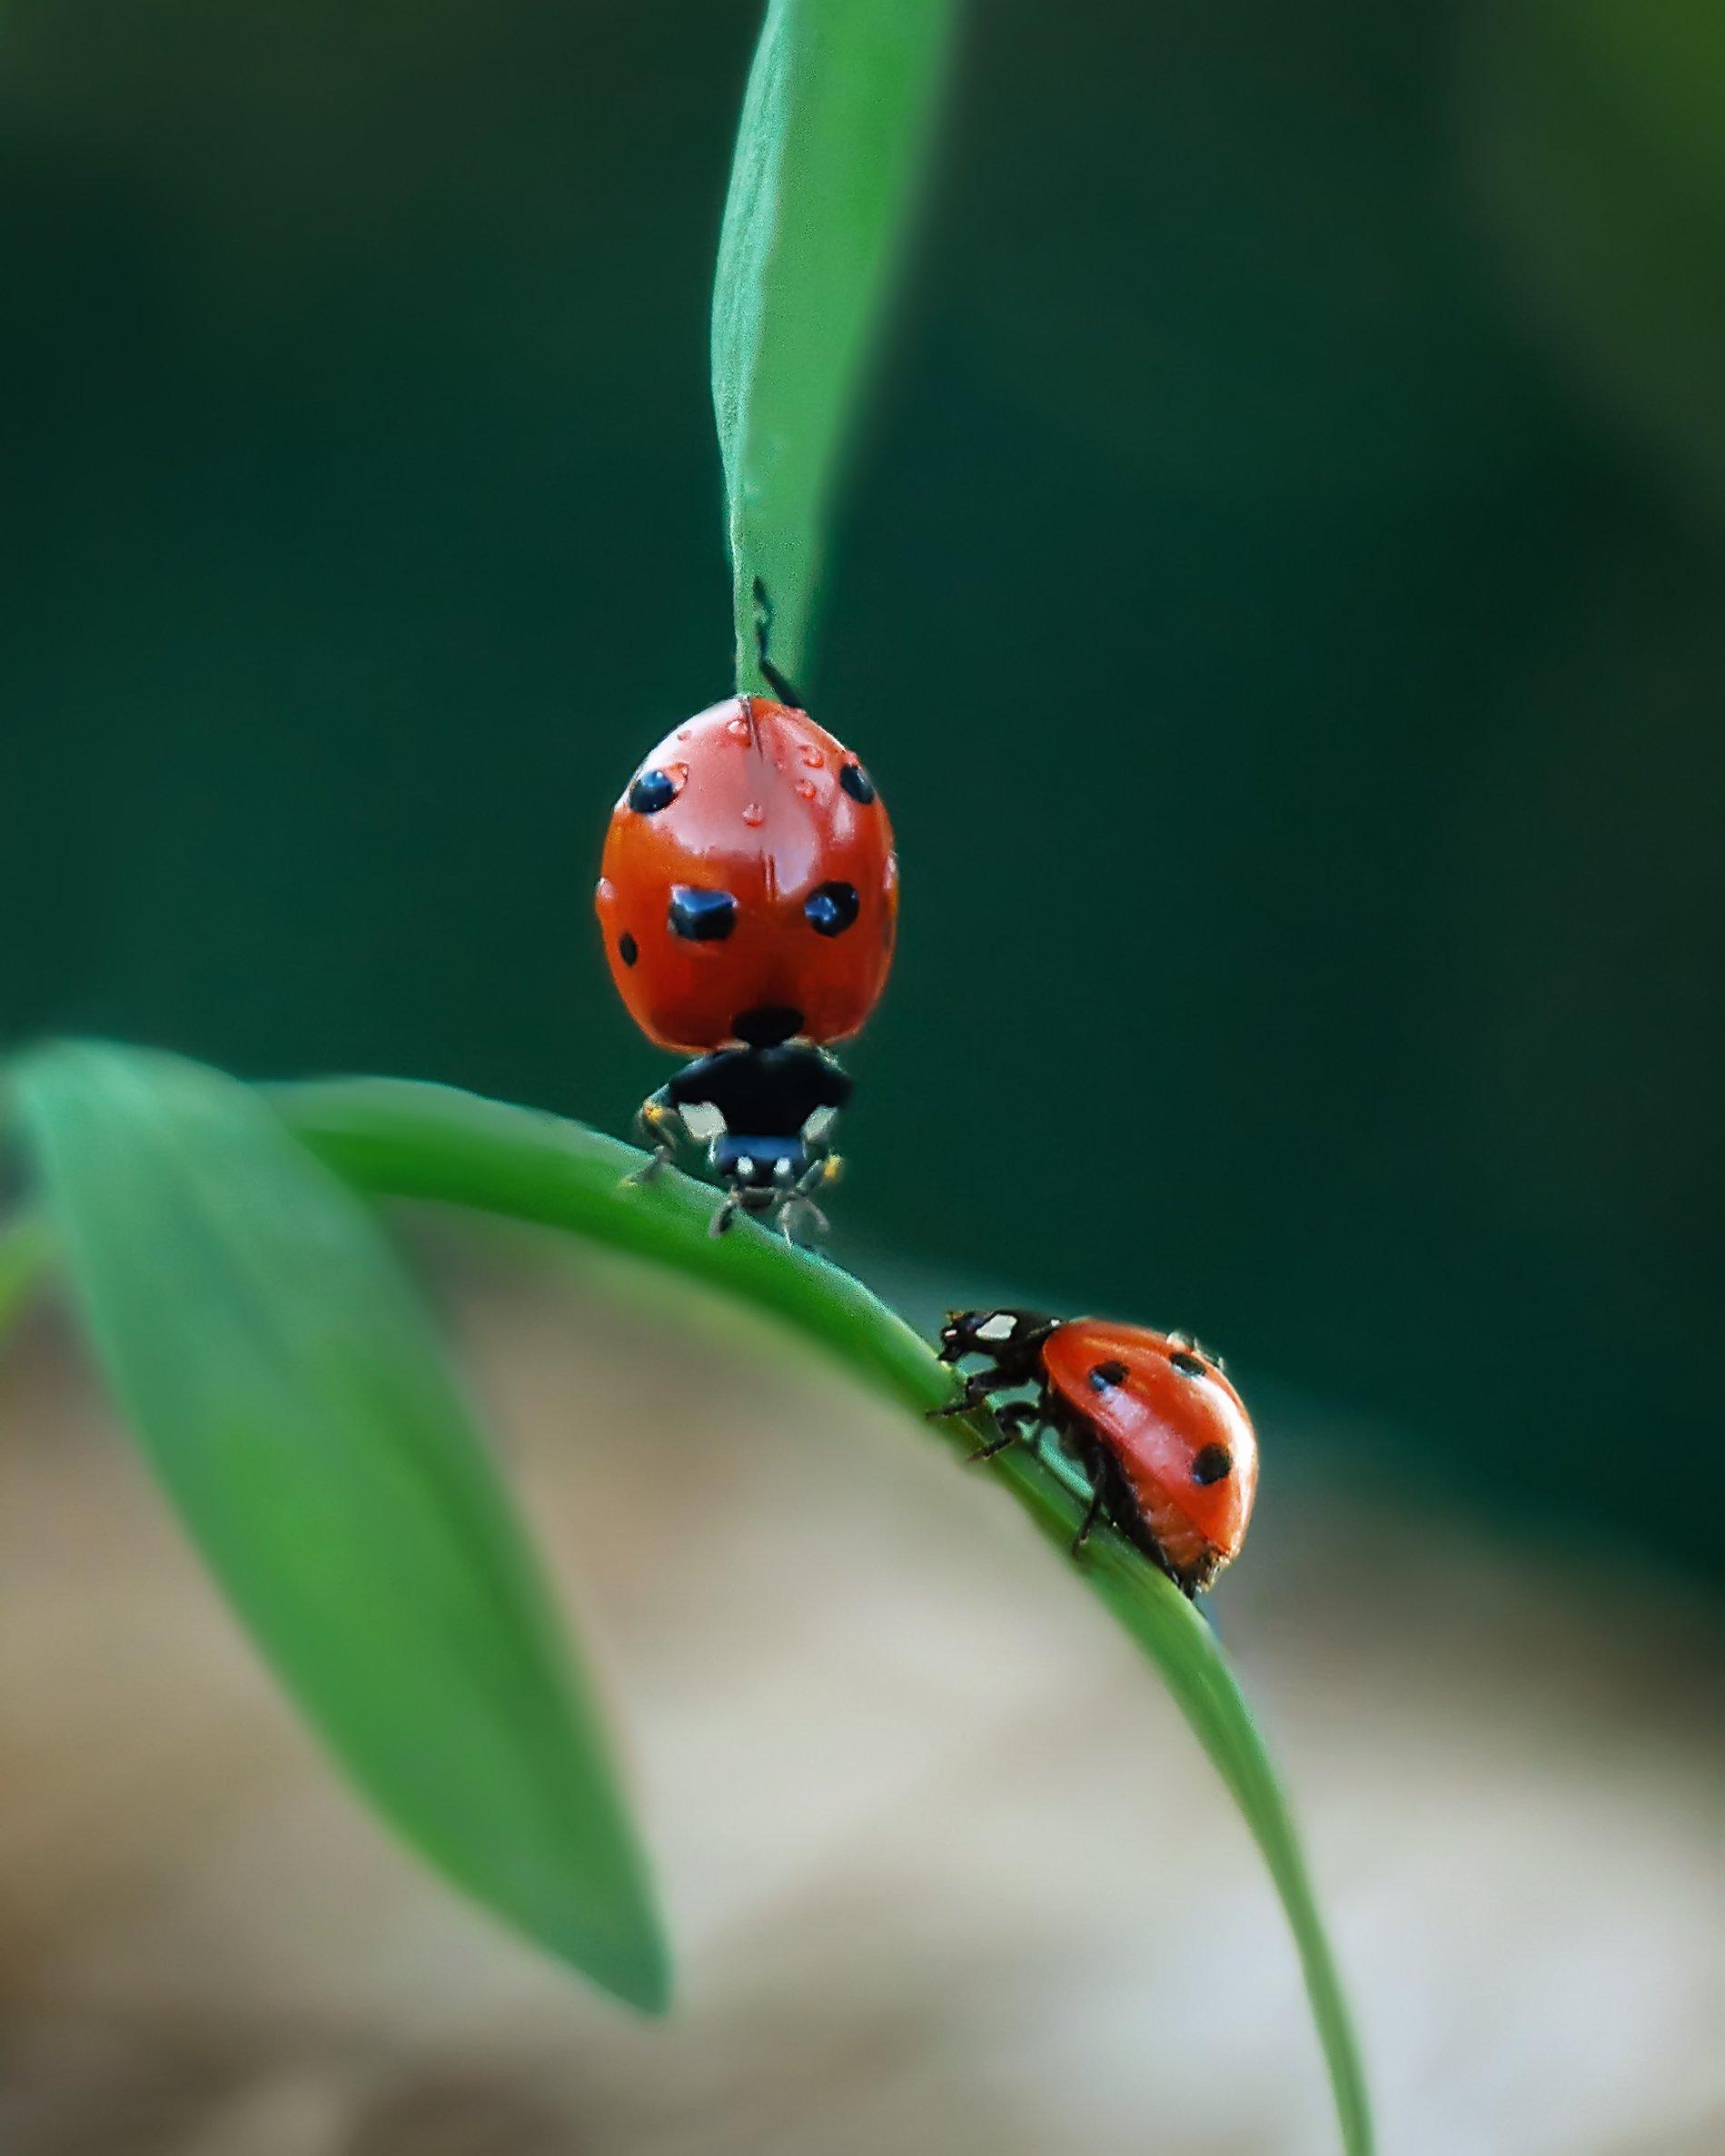 macro insects helios44-2 nature, Анастасия Колесникова